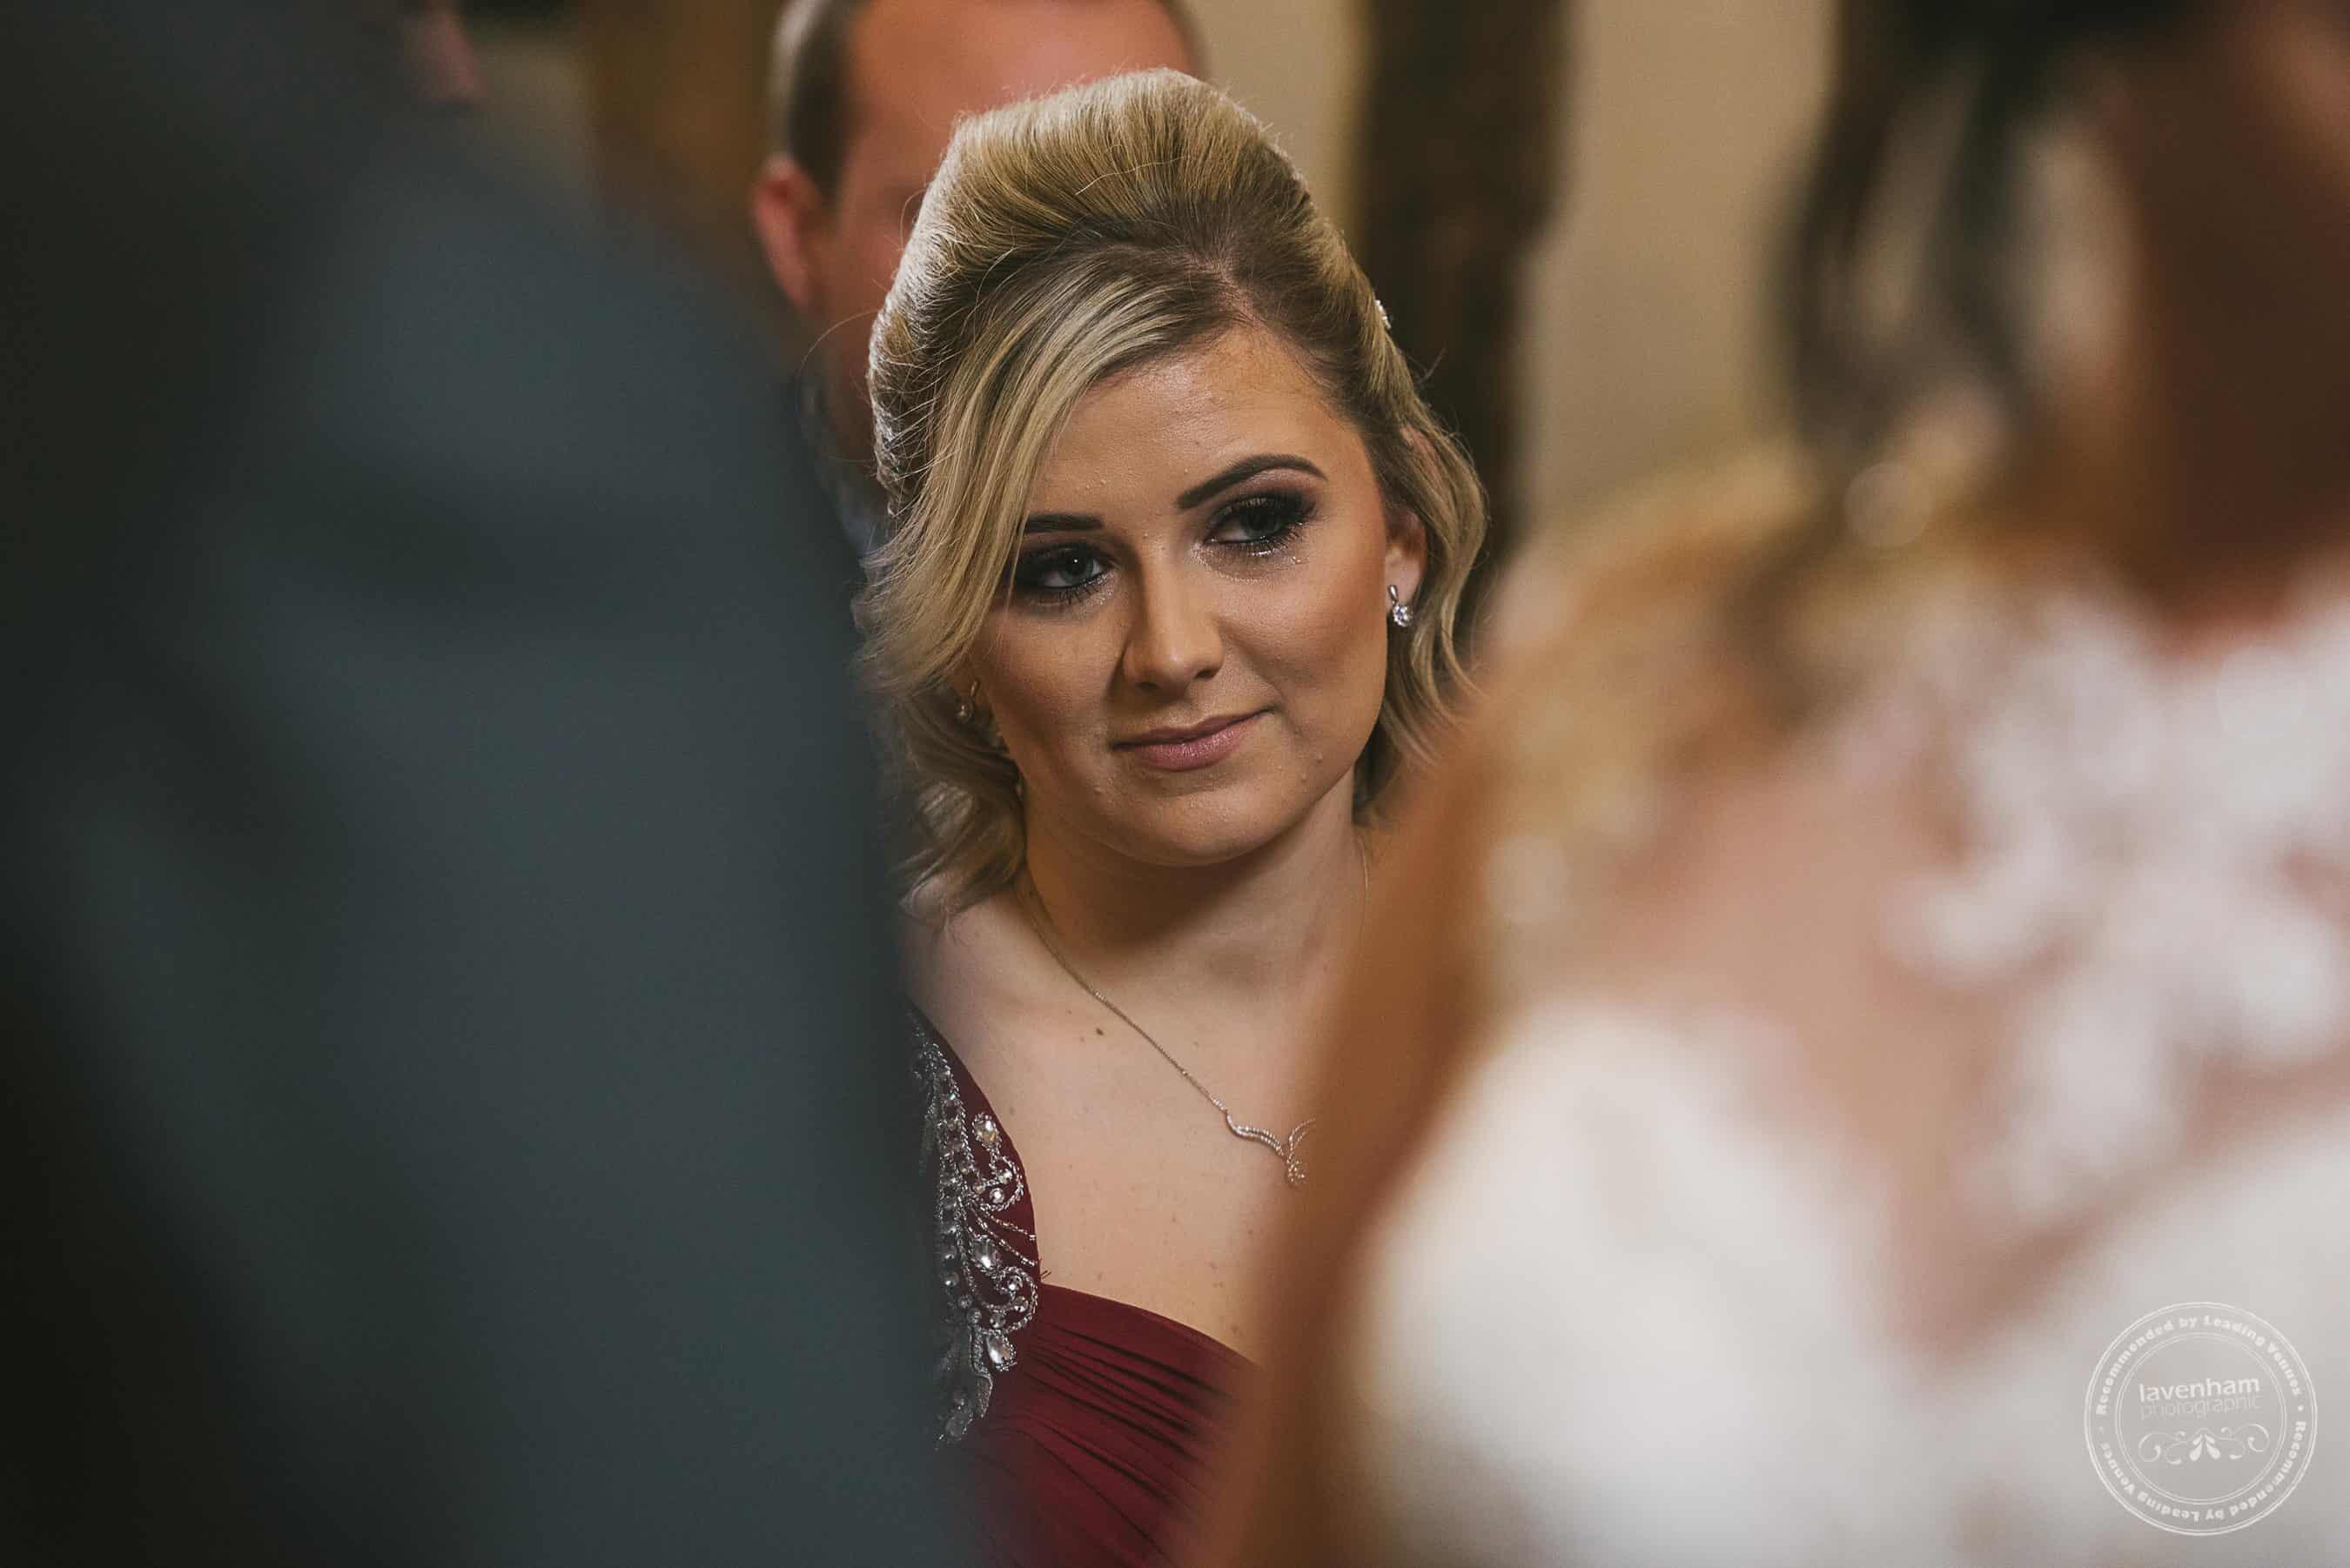 251118 Leez Priory Wedding Photography by Lavenham Photographic 039